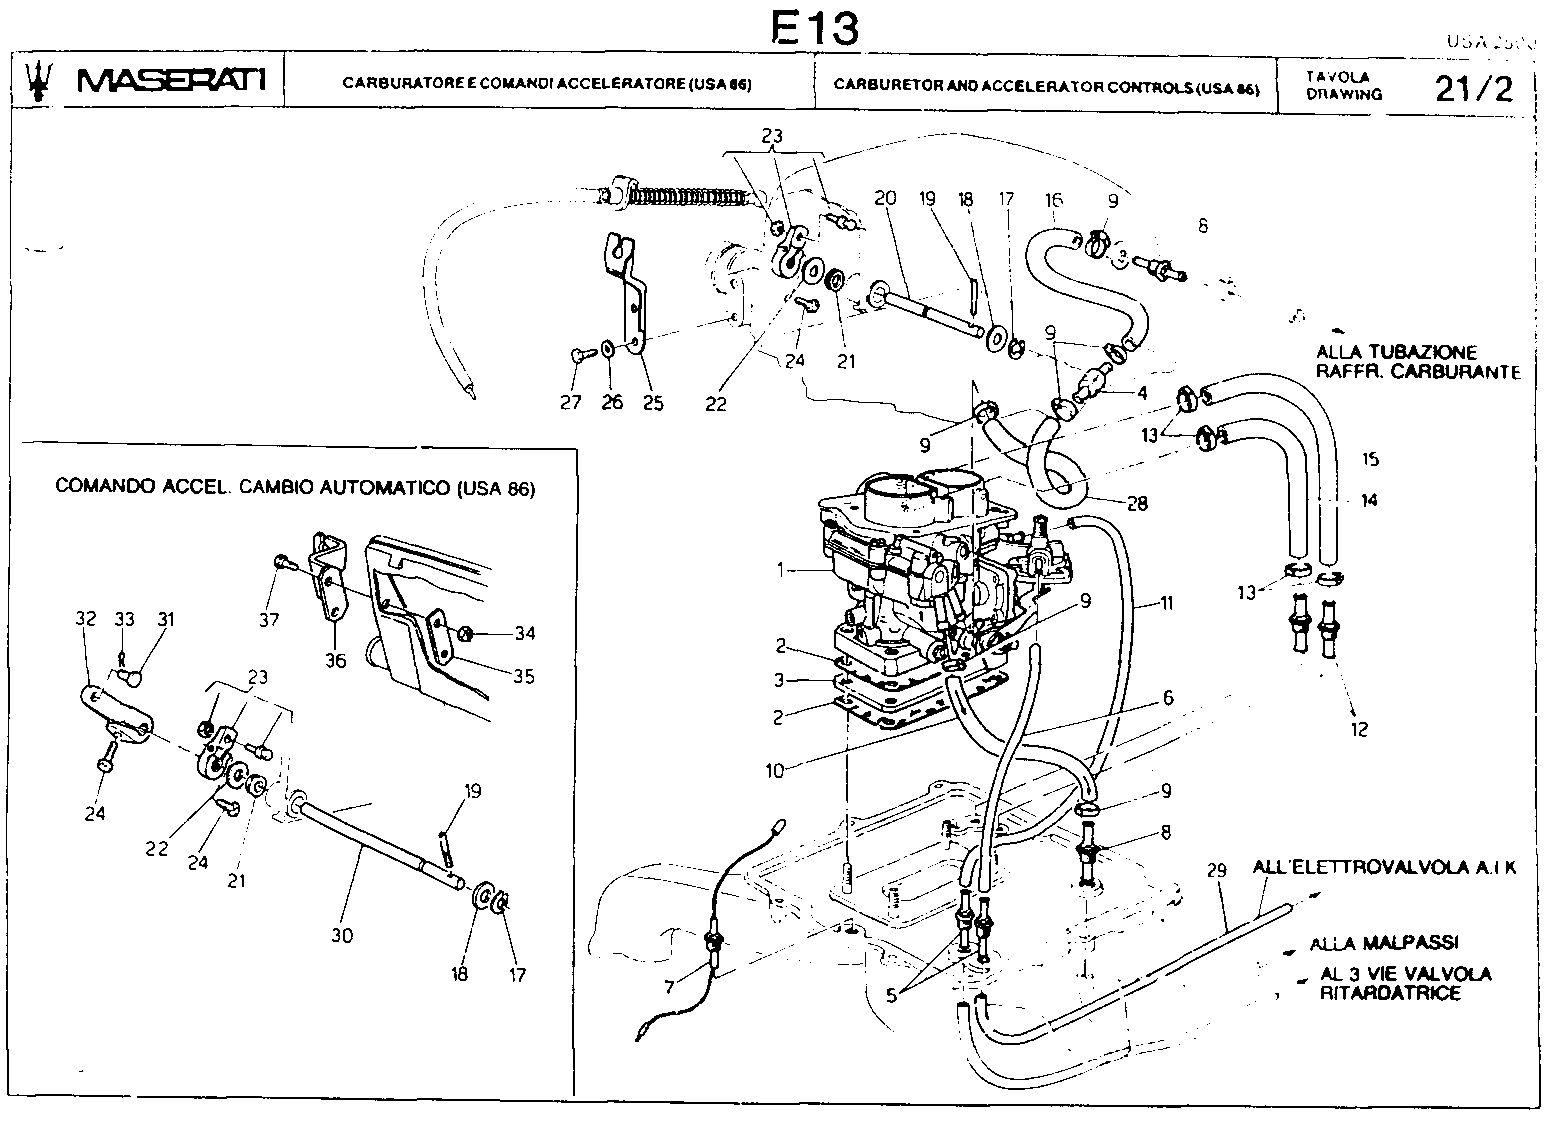 1985 944 porsche part diagram html